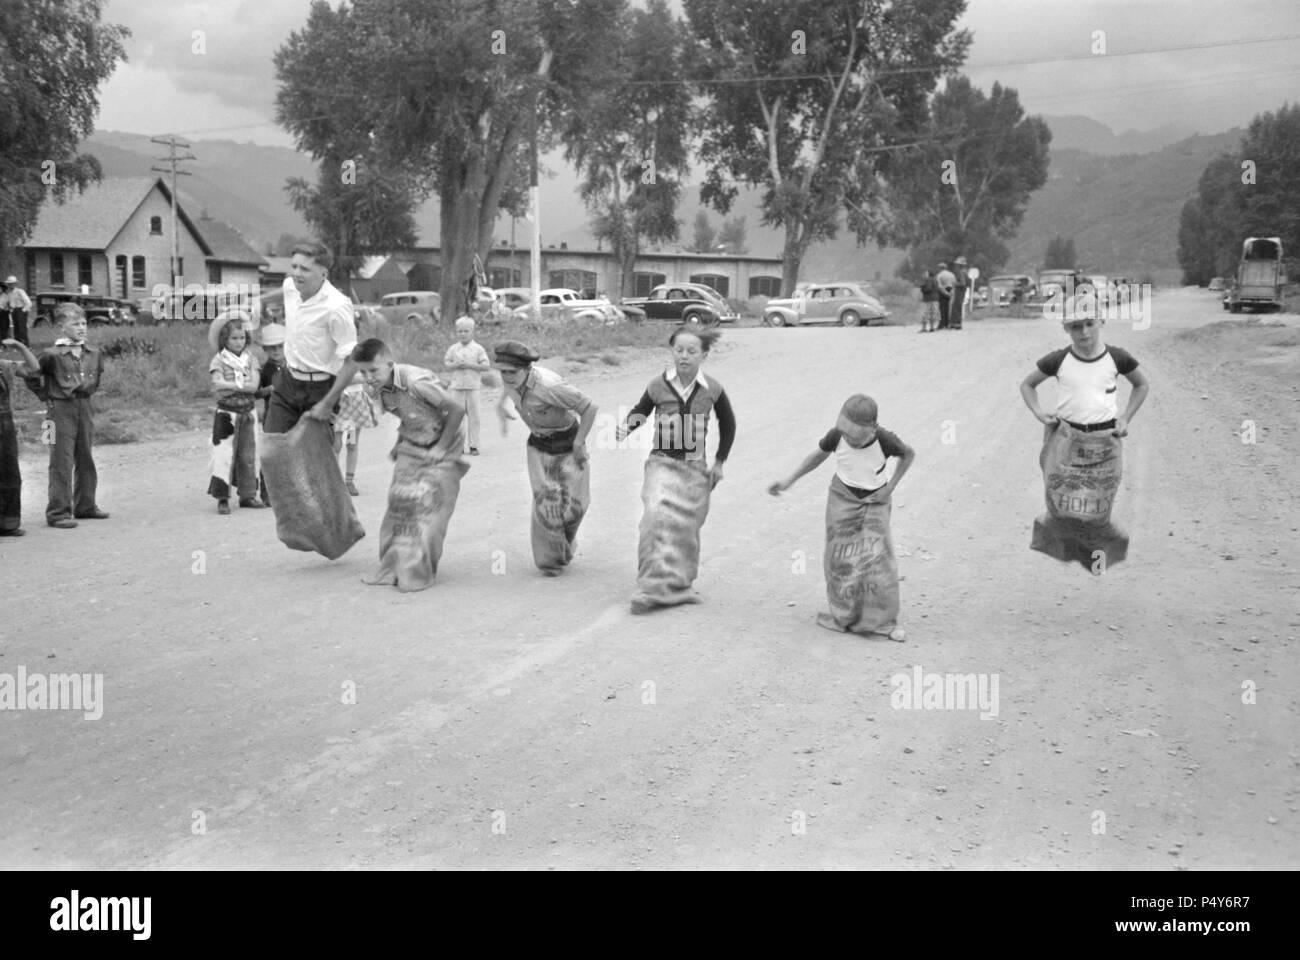 Boys Potato Sack Race, Labor Day Celebration, Ridgway, Colorado, USA, Russell Lee, Farm Security Administration, September 1940 - Stock Image